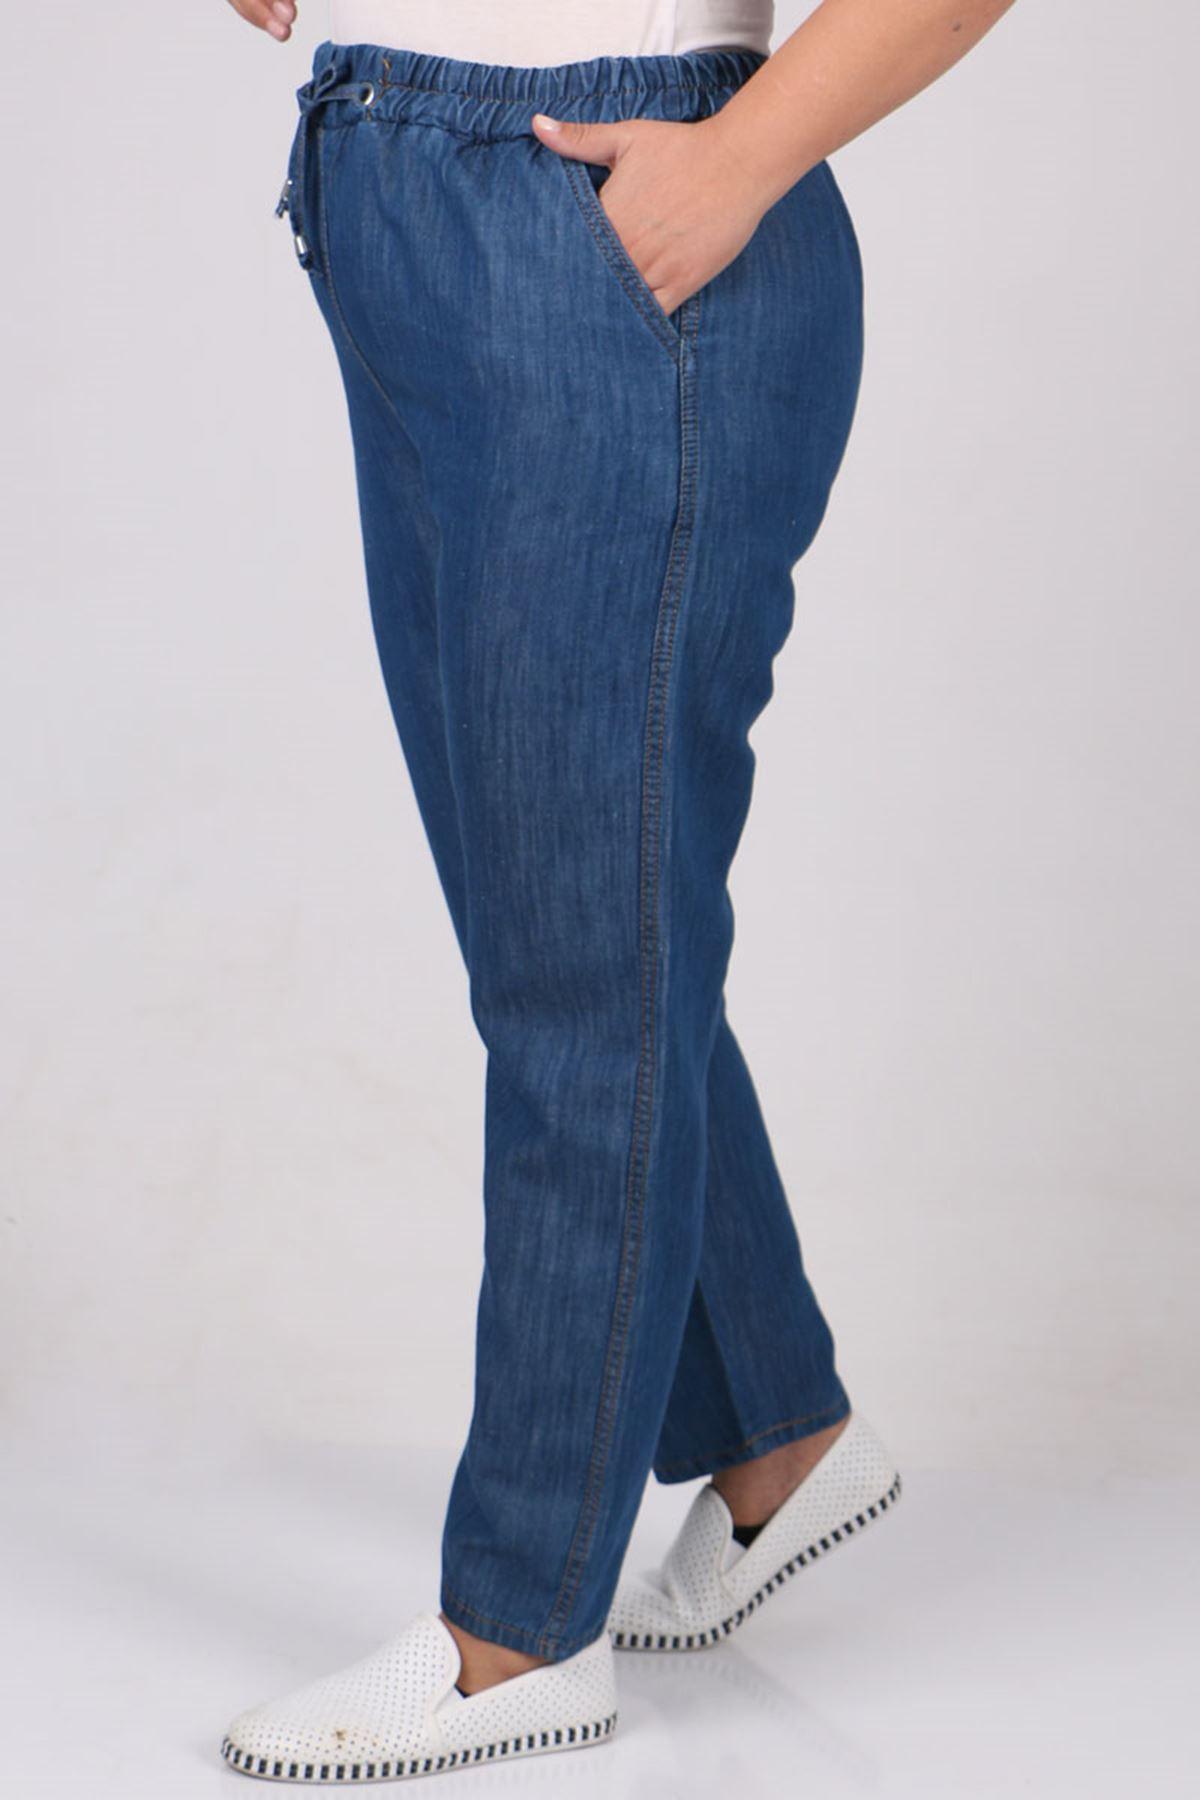 9173 Büyük Beden Dar Paça Kot Pantolon - Mavi